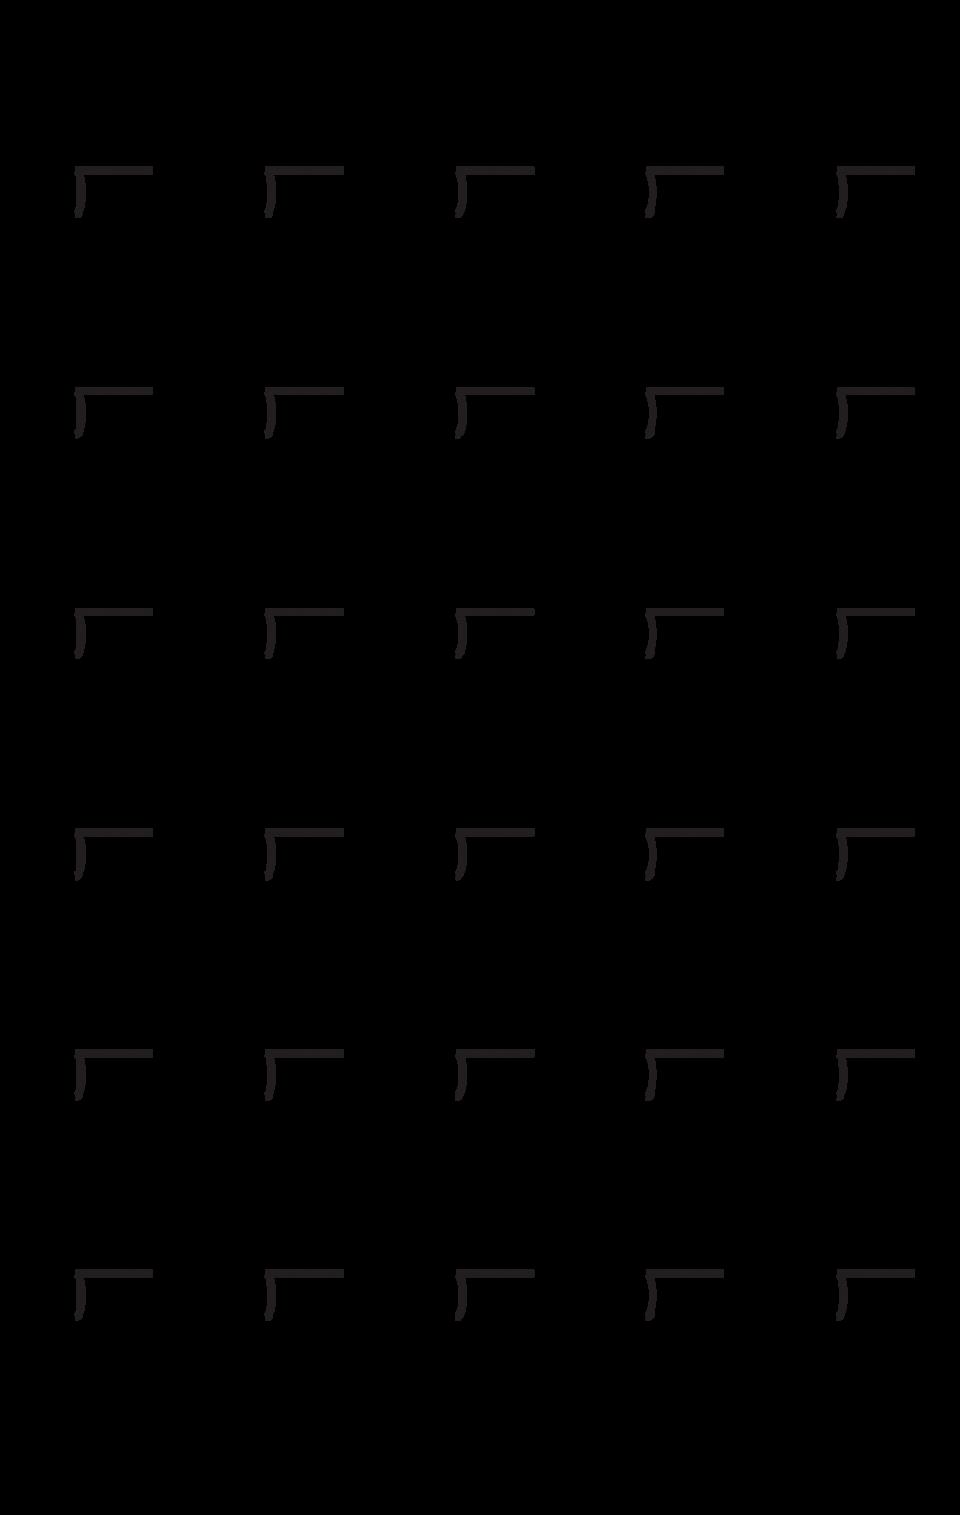 Multiplication clipart math sheet. Relating multiplicationnd division worksheets